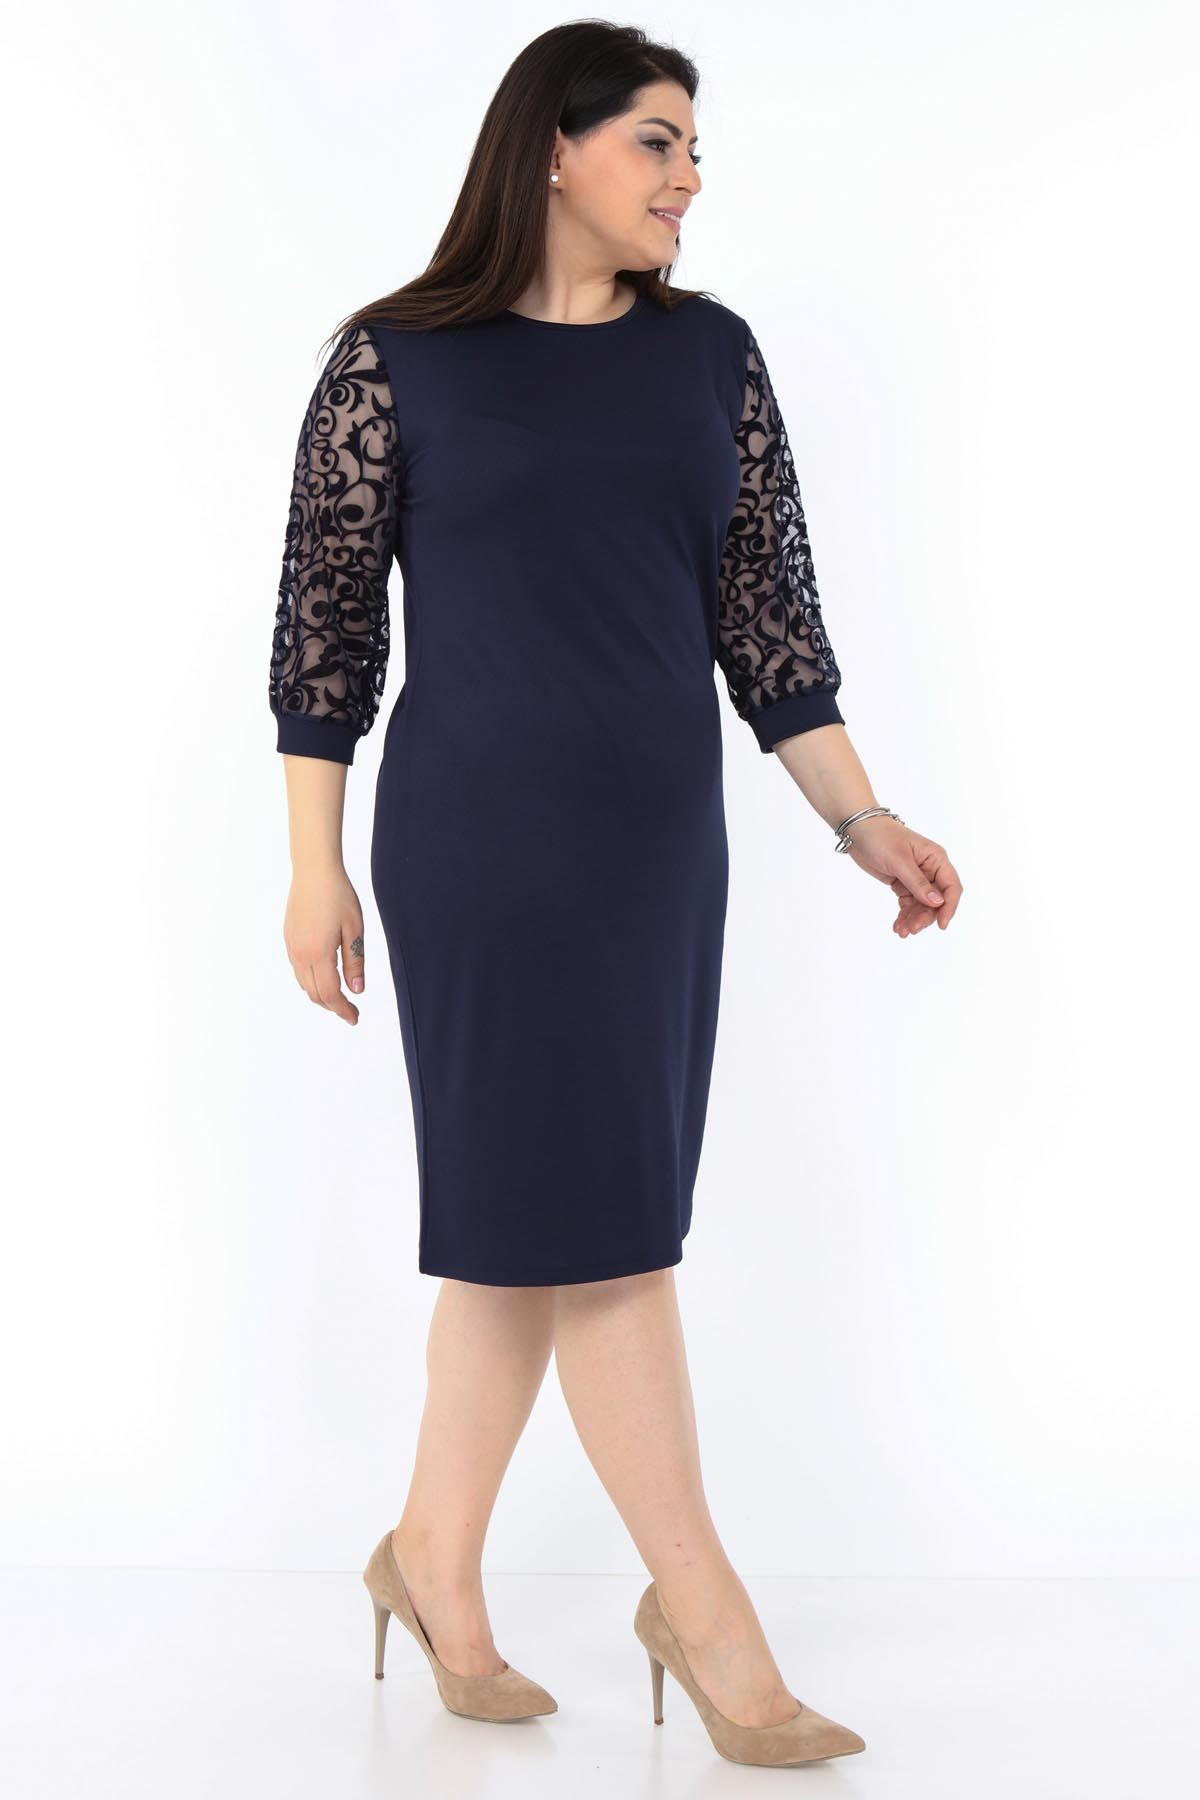 Lacivert Dantel Kol Büyük Beden Elbise 8A-0995